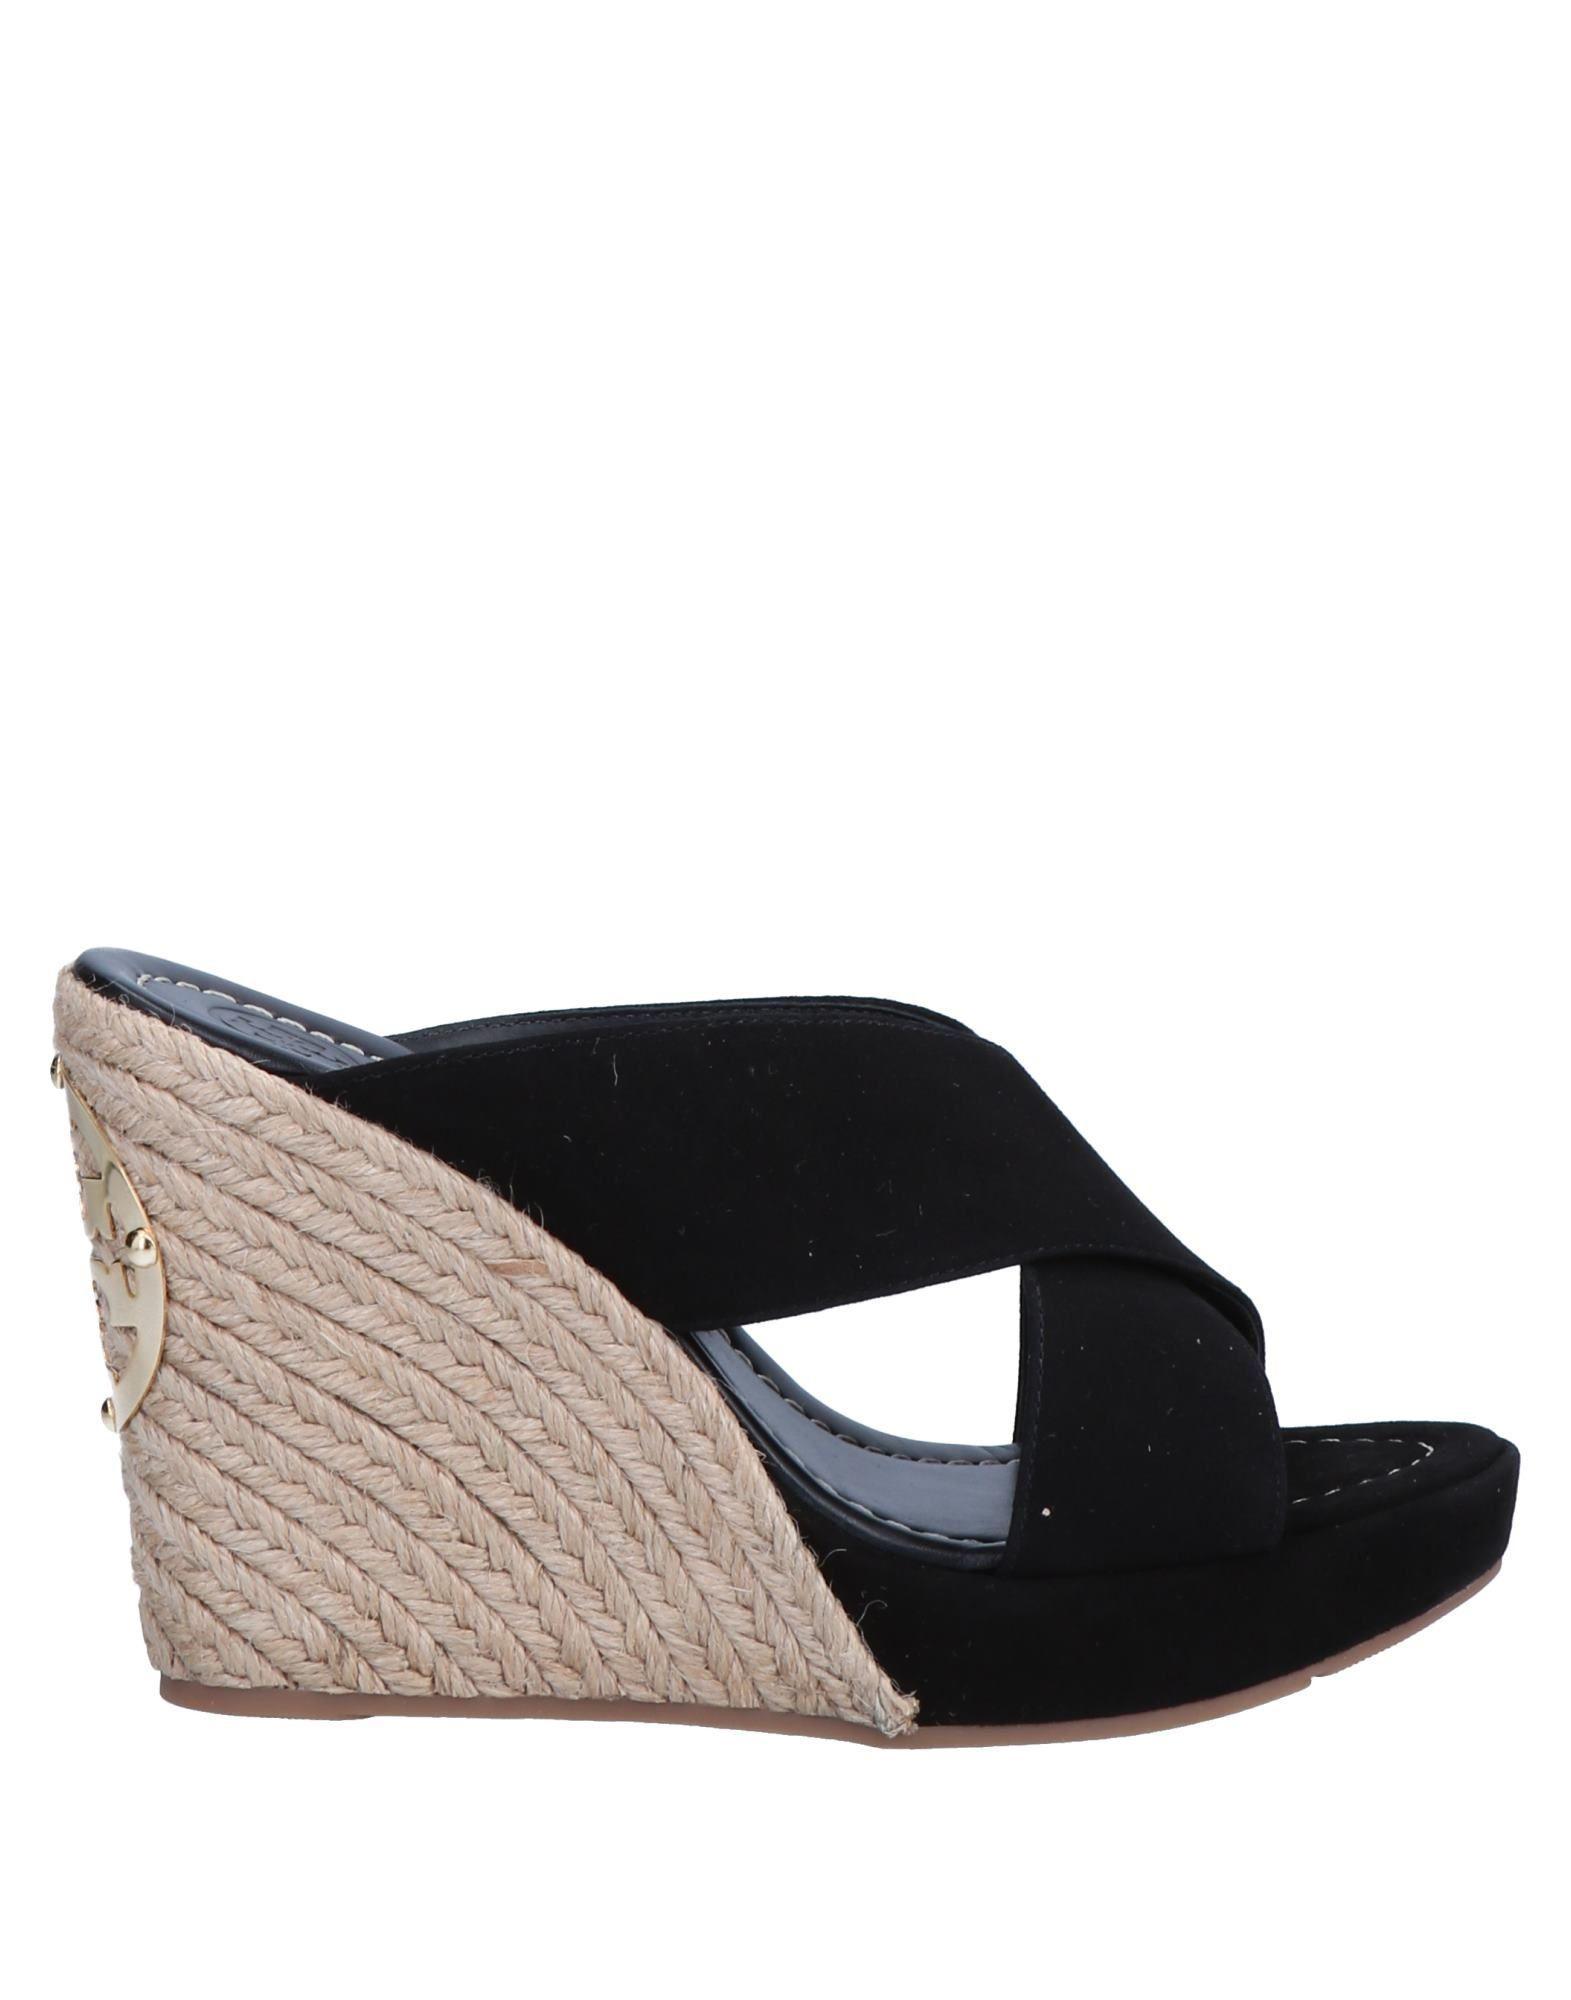 00361ba7958 Tory Burch Sandals in Black - Lyst